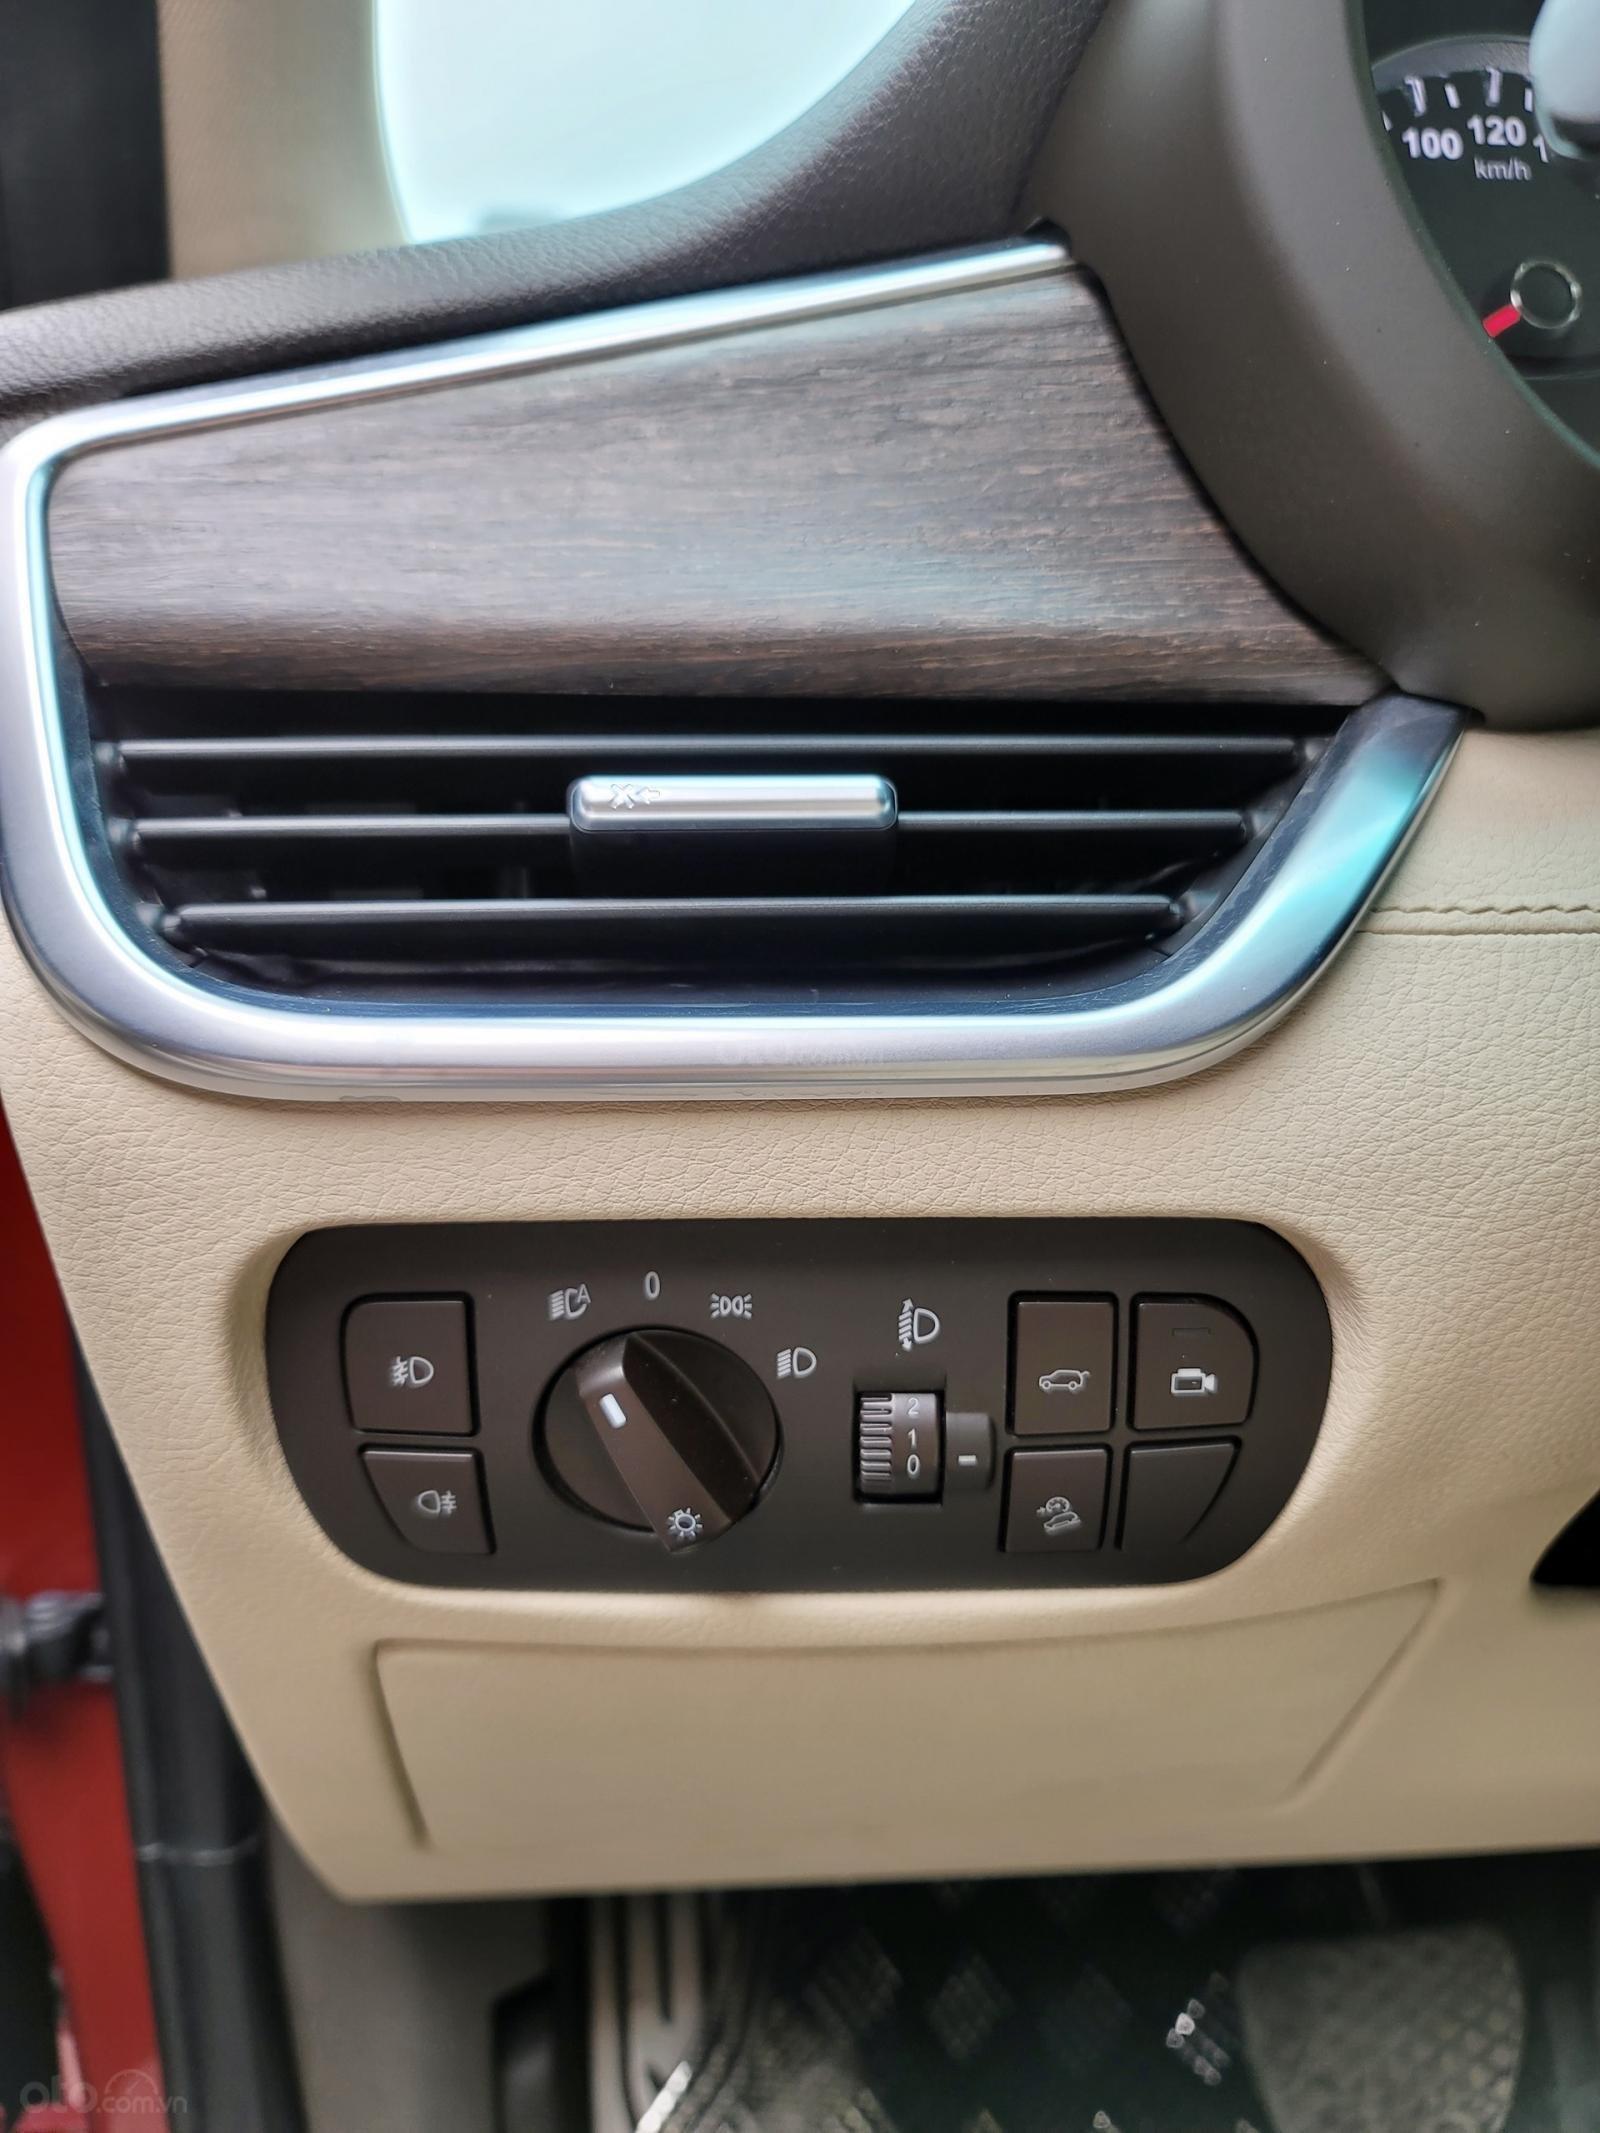 VinFast LUX SA2.0 Turbo Premium sản xuất năm 2019 (9)